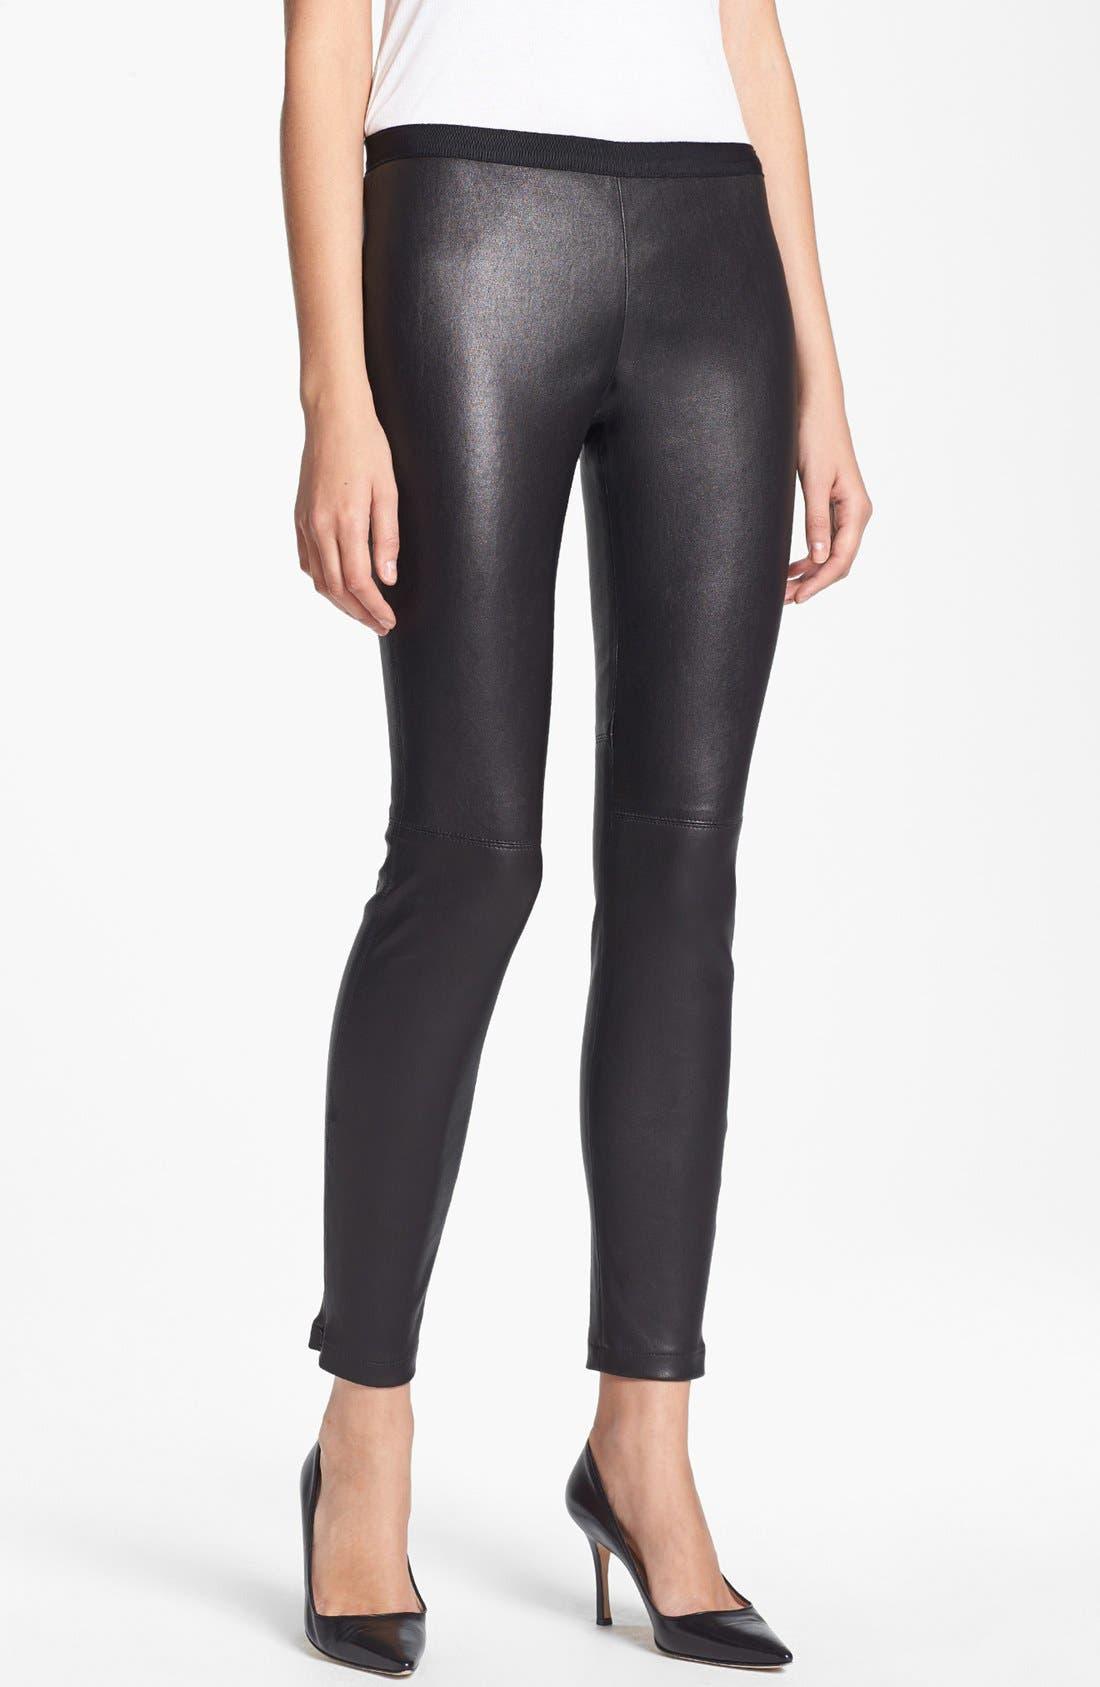 Alternate Image 1 Selected - Miss Wu Leather Leggings (Nordstrom Exclusive)